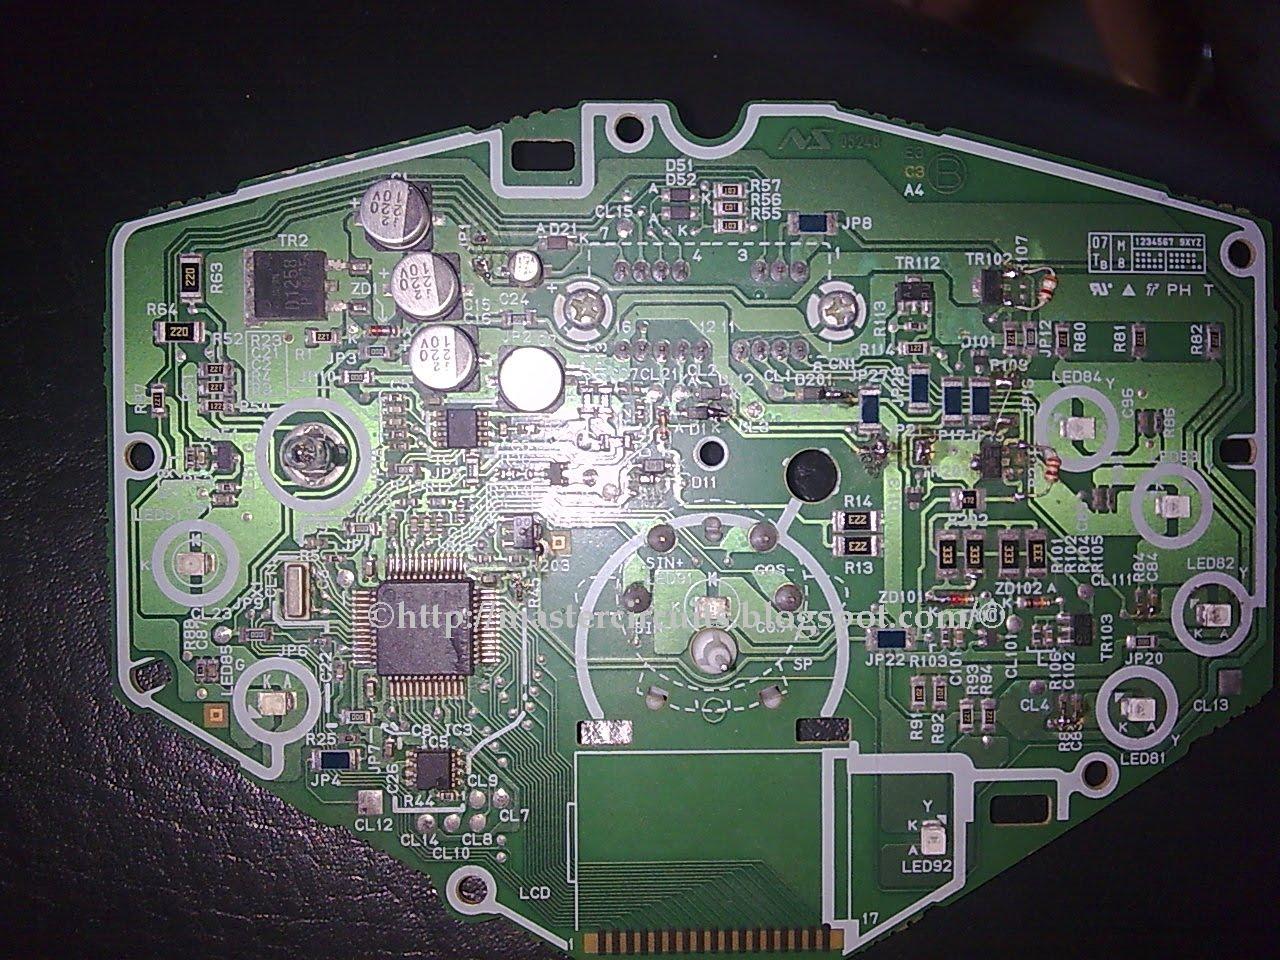 Info Manual: Shogun Sdometer Panel on